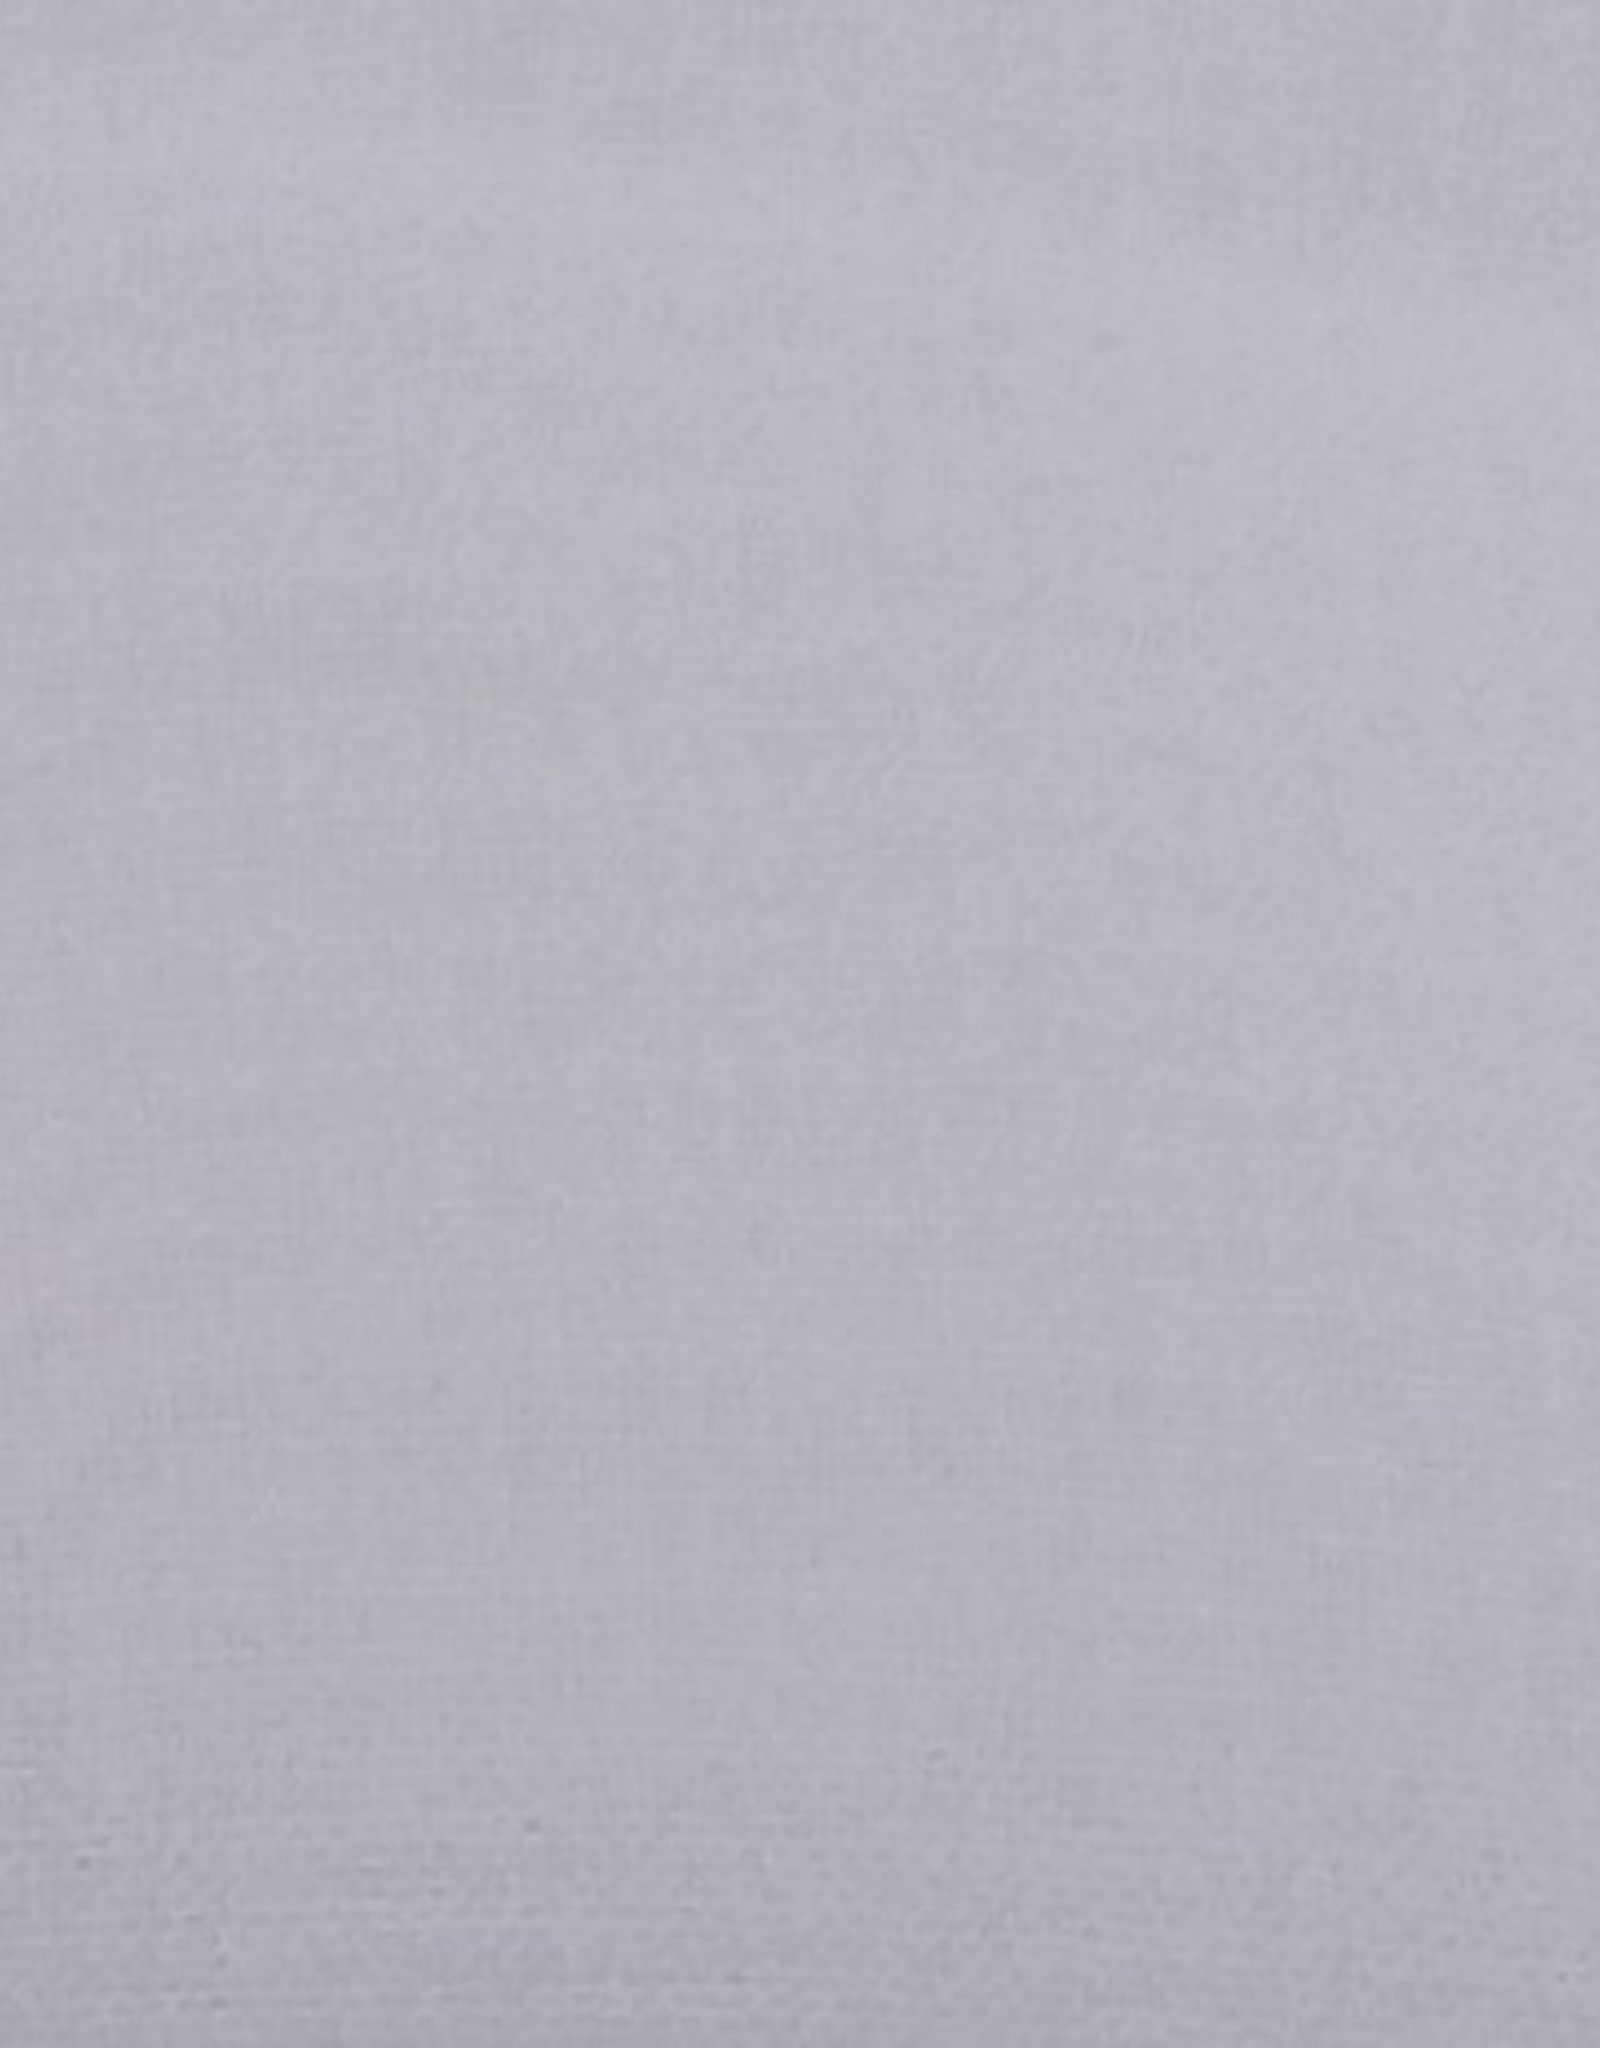 Chiffon 58 - 60 Inches White (Yard)